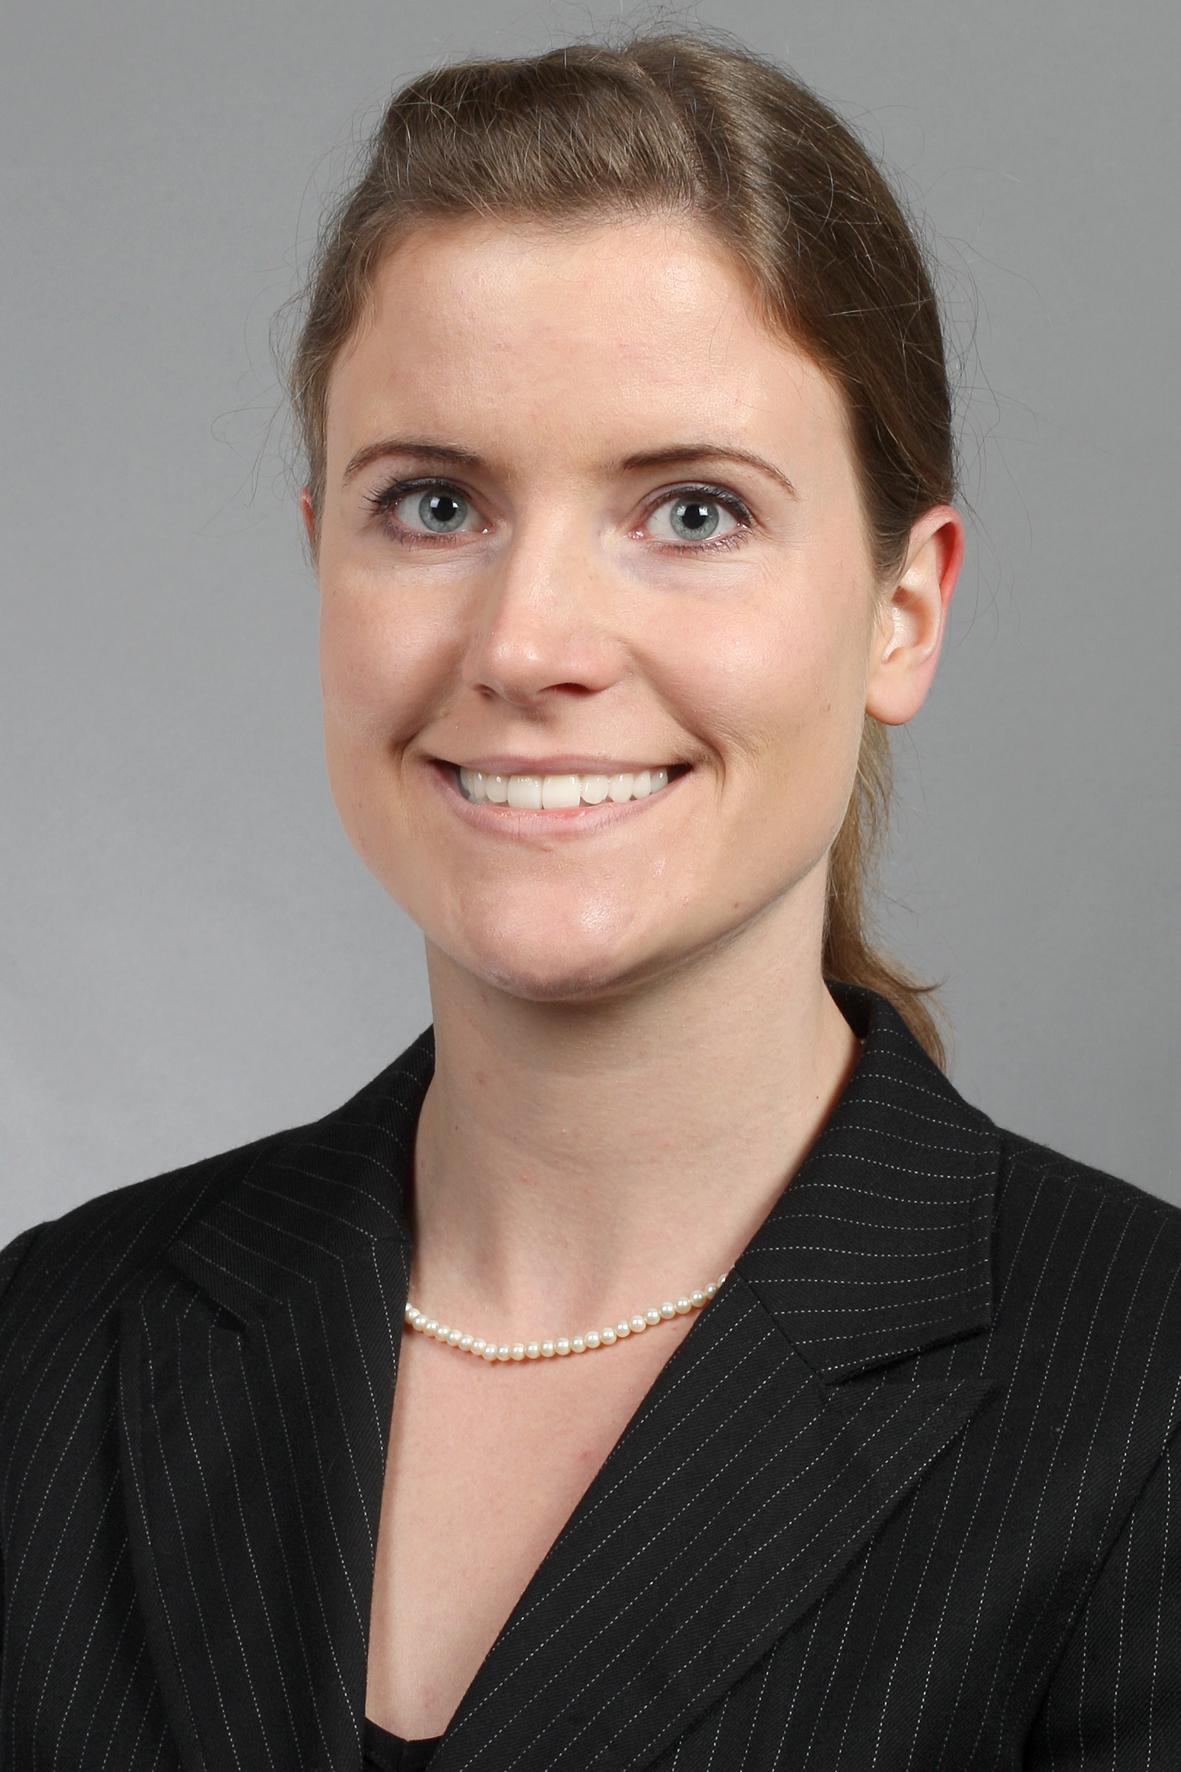 Dr. Bettina Stahnke